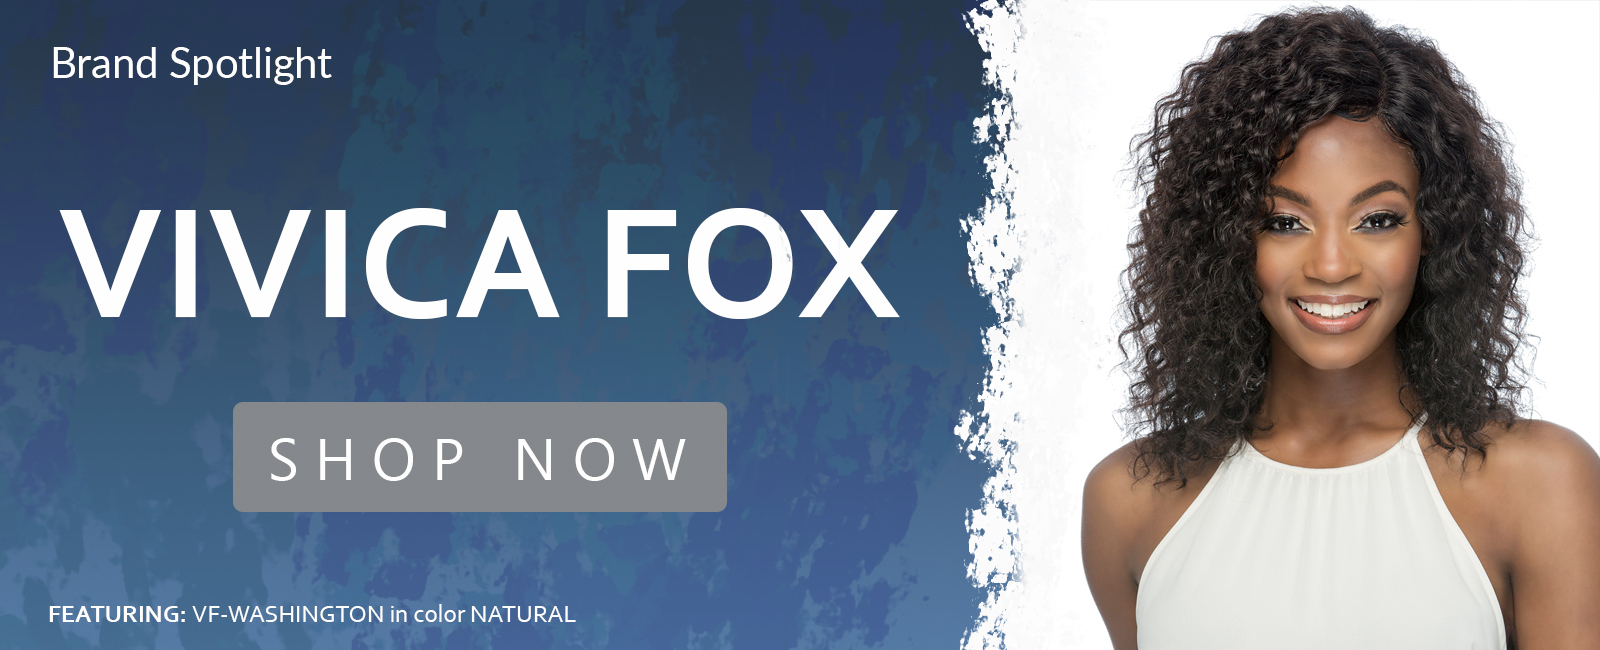 vivica-fox-spotlight-mobile